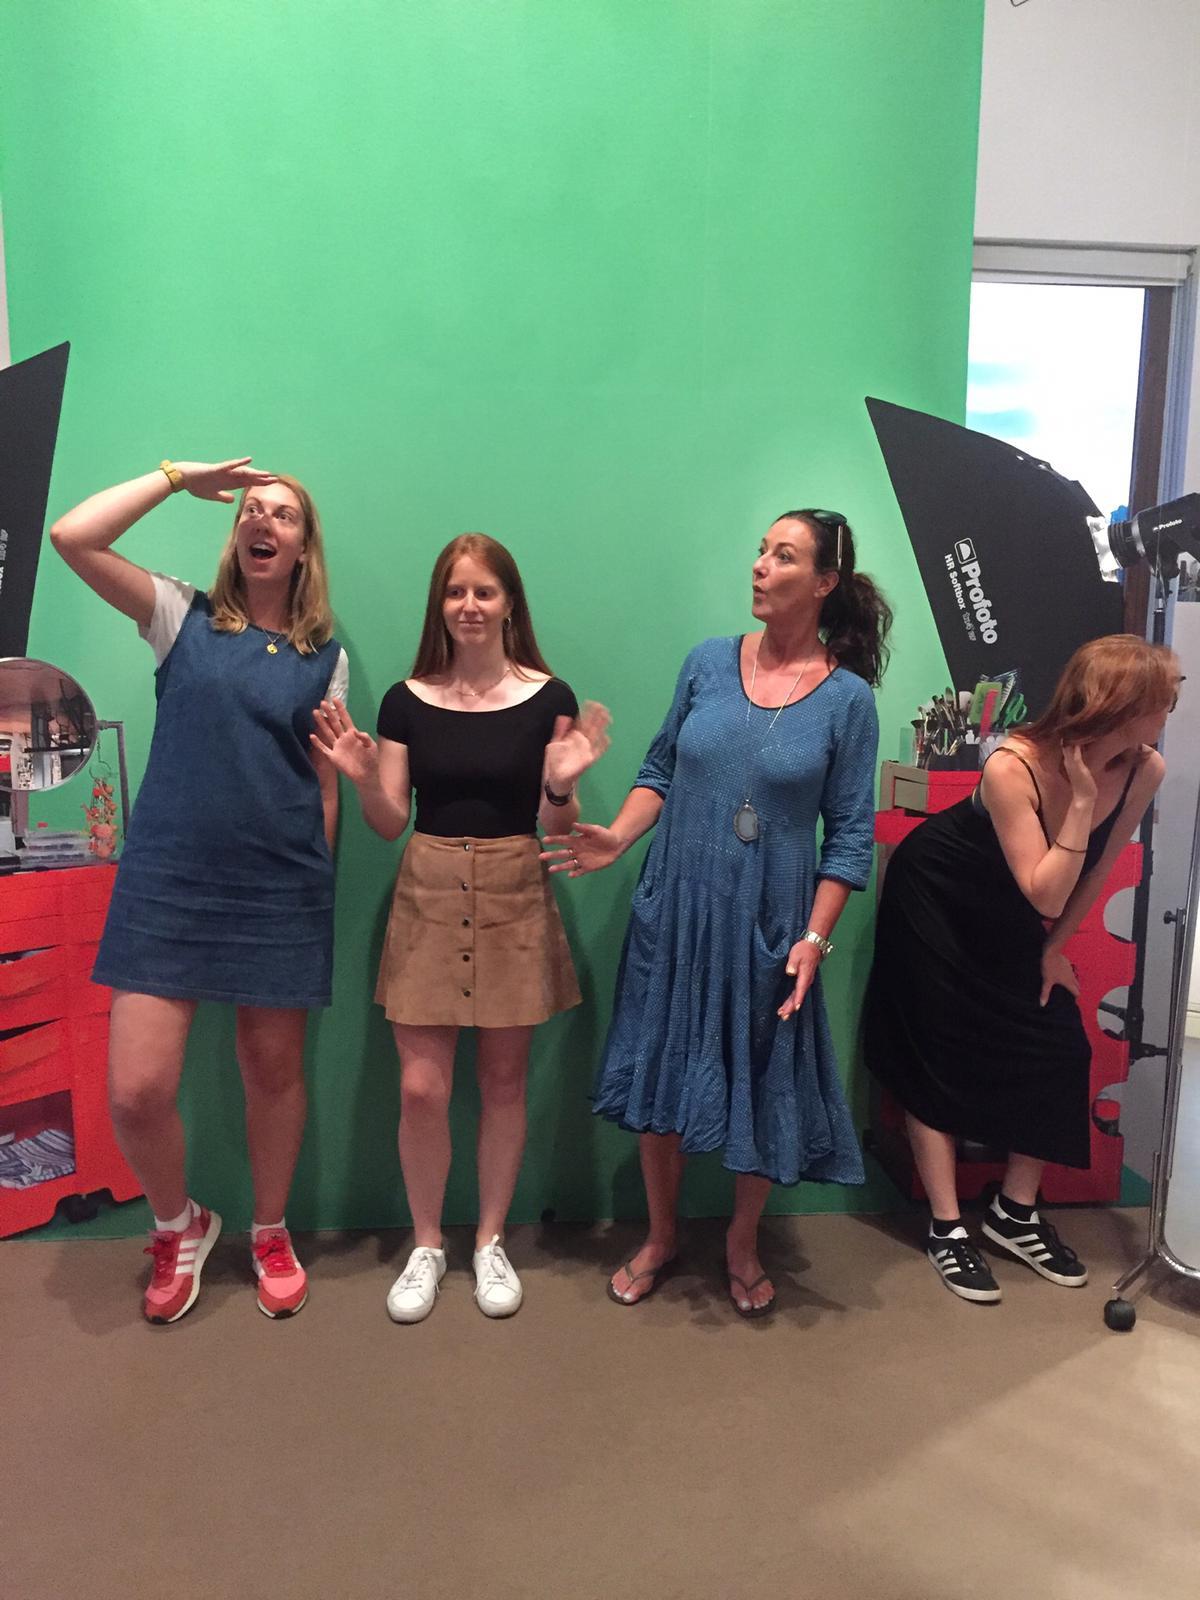 Clio, Anna, Lisa, Chloe (and Georgina behind the camera)